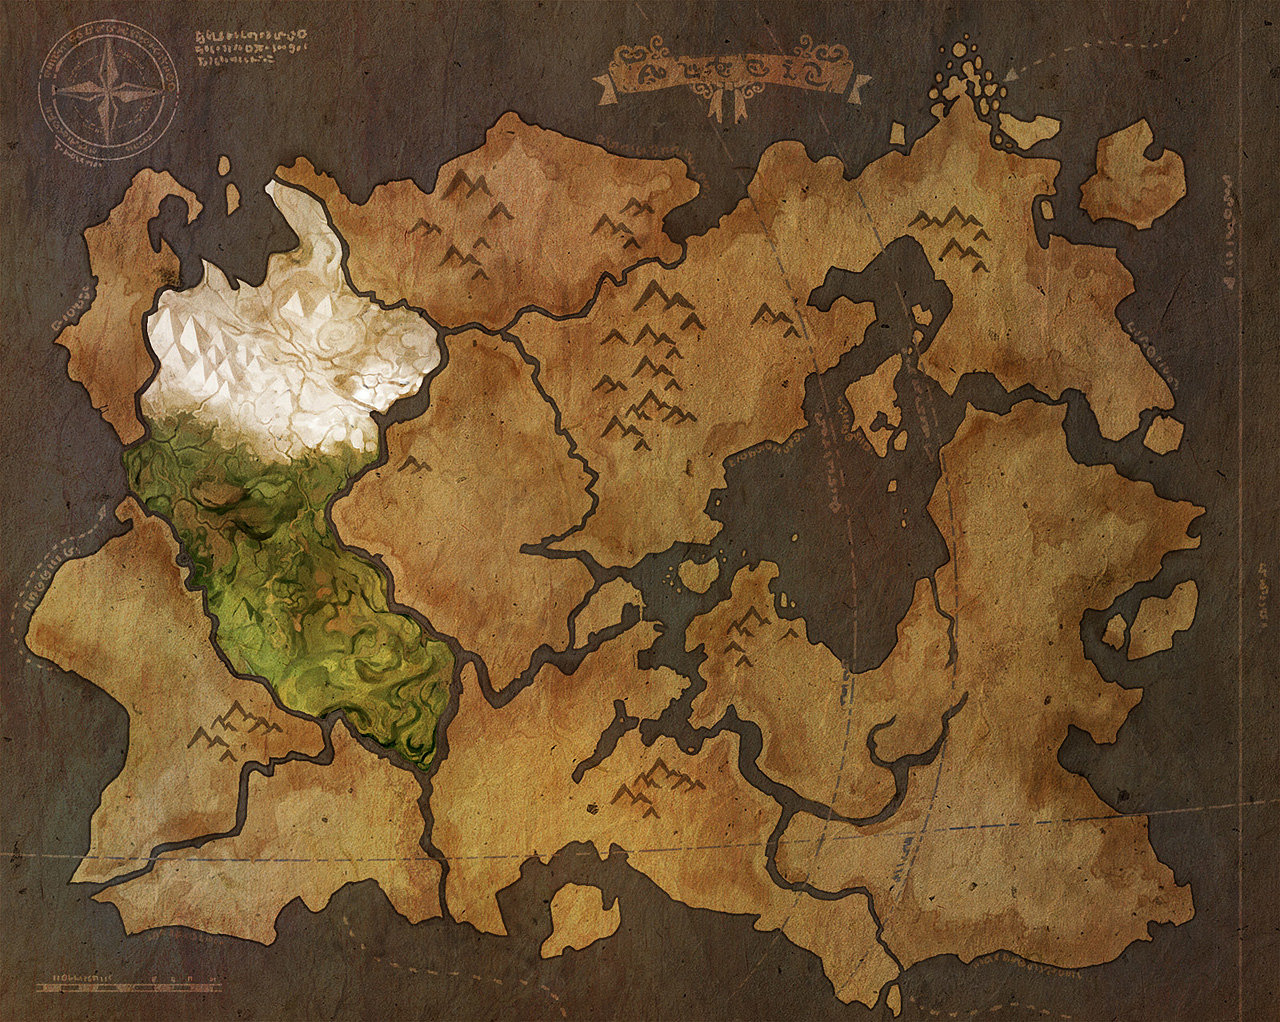 Seung chan lee ui worldmap